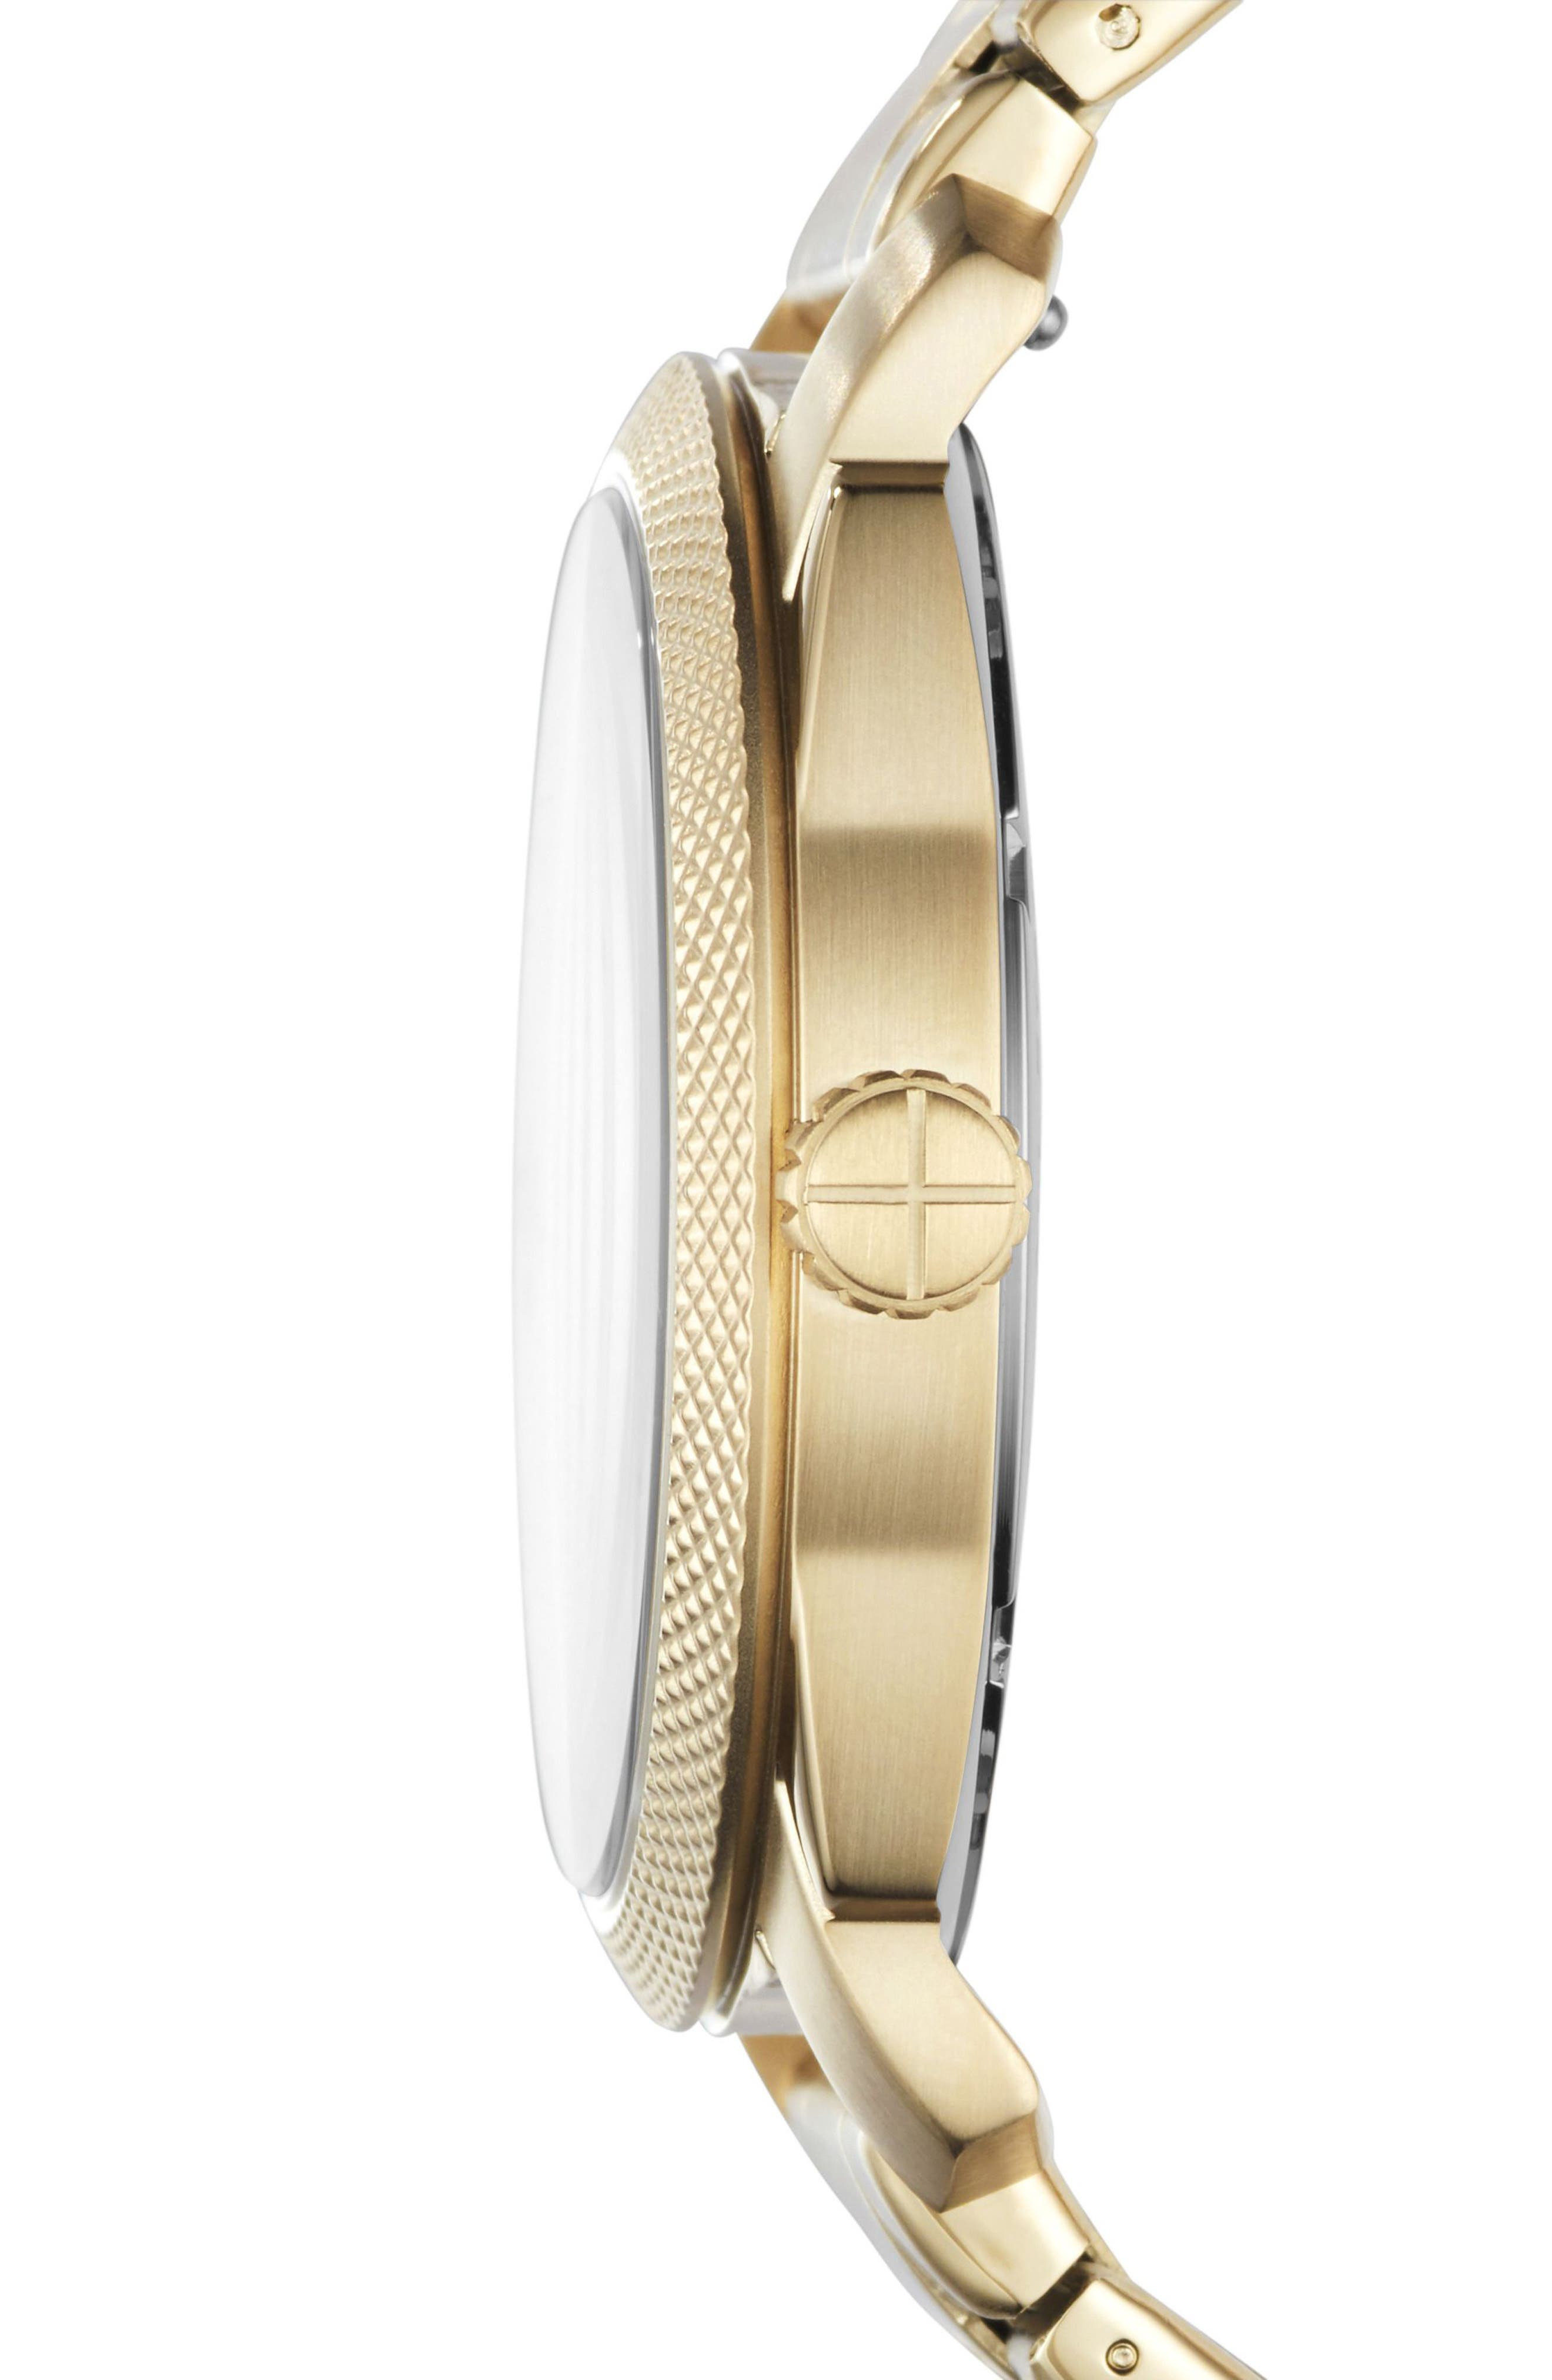 FOSSIL, Machine Bracelet Watch, 42mm, Alternate thumbnail 2, color, GOLD